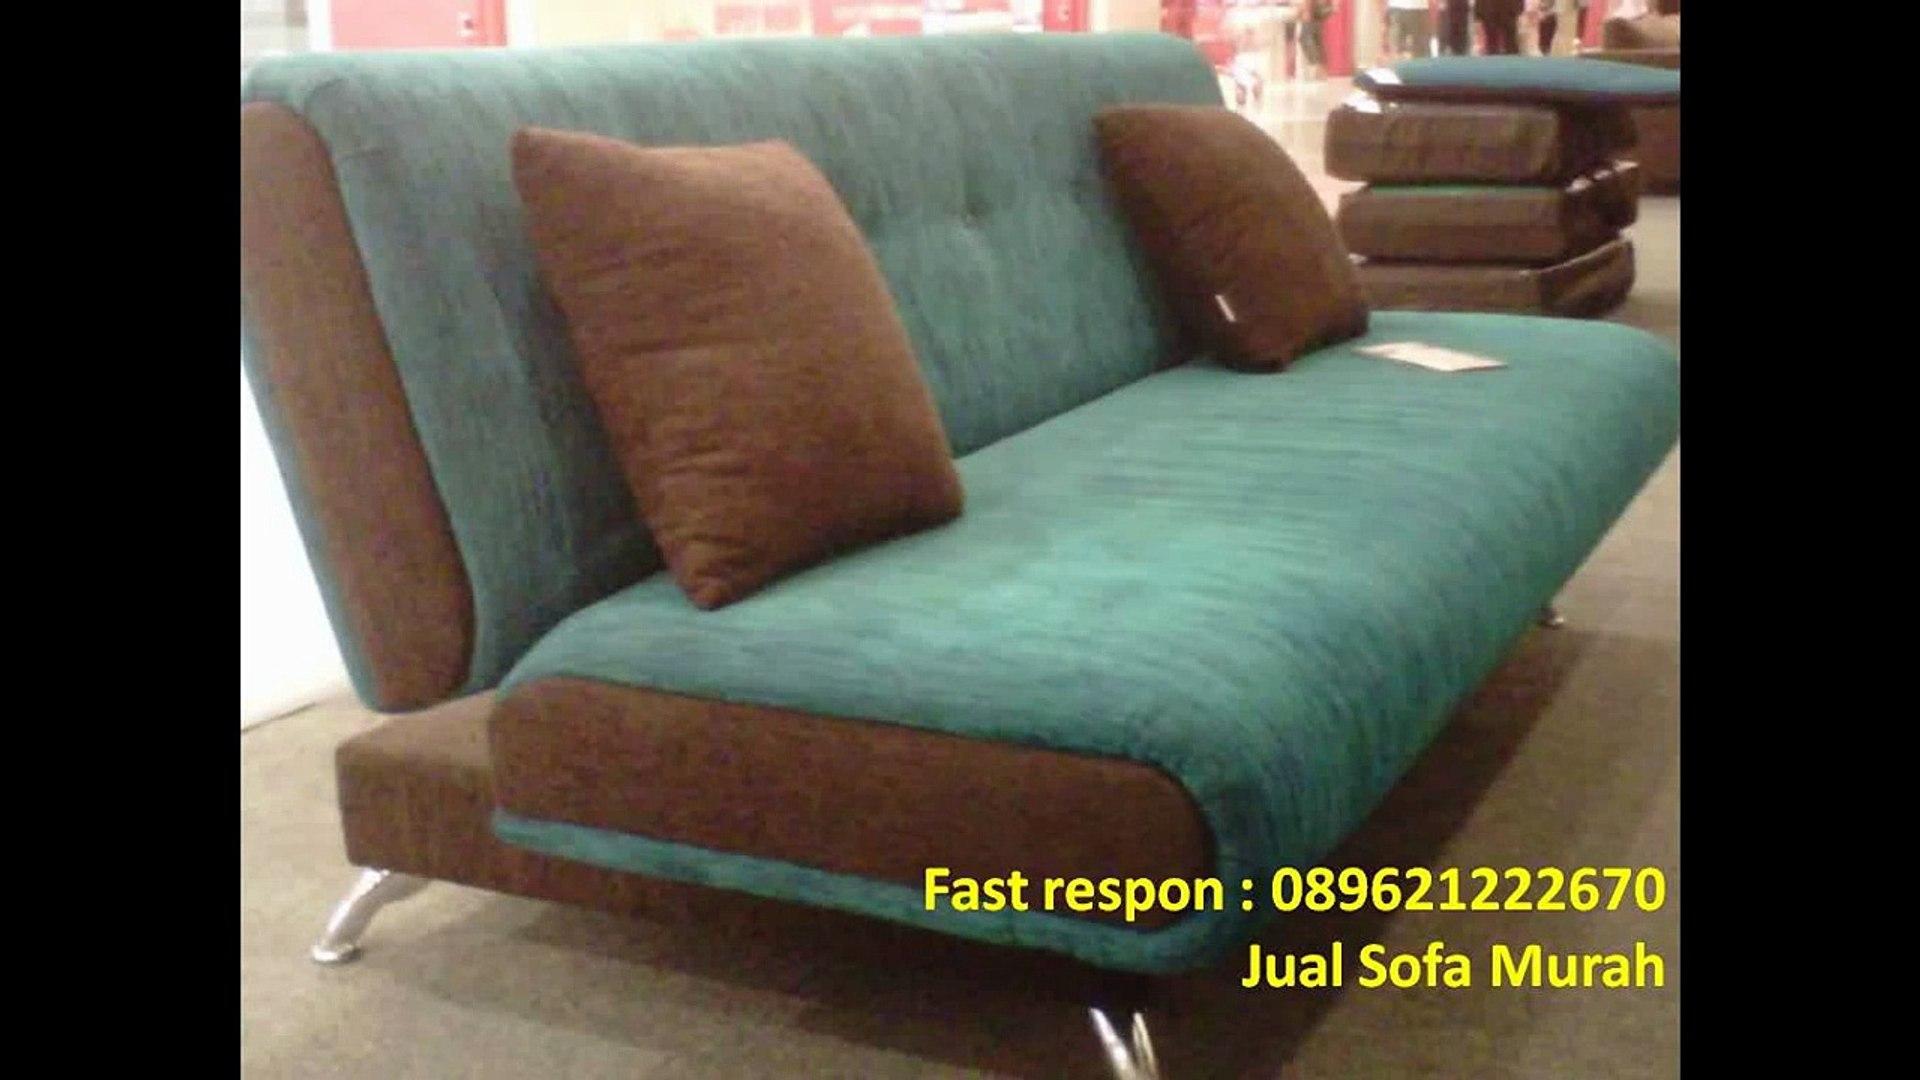 Astounding 089621222670 Tri Jual Sofa Bed Minimalis Sofa Bed Bandung Sofa Bed Anak Spiritservingveterans Wood Chair Design Ideas Spiritservingveteransorg